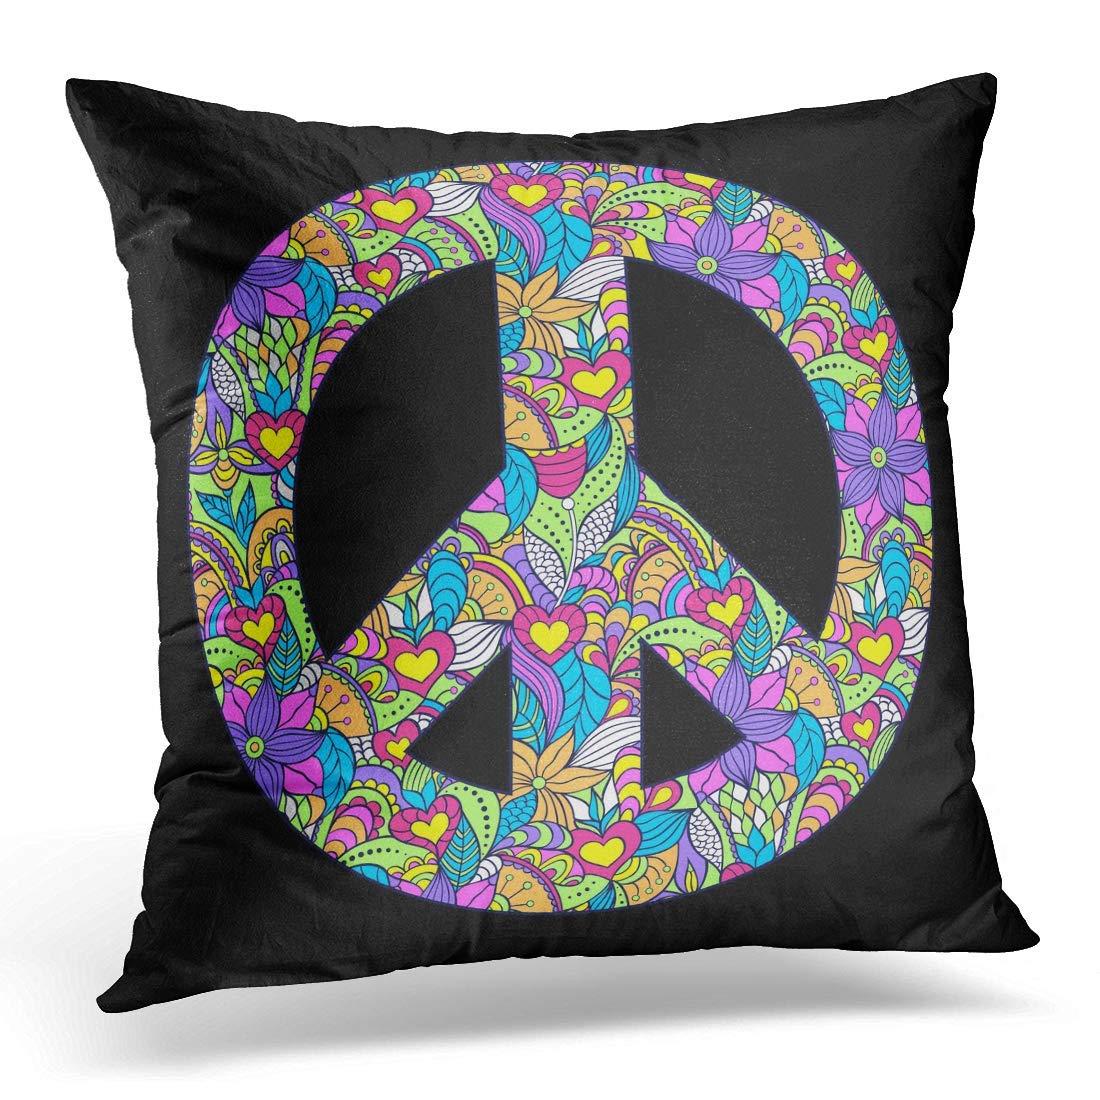 Funda de Almohada Throw Pillow Signo Azul del s/ímbolo de Paz Colorido en Hippie Verde Negro Funda de Almohada Decorativa Coj/ín para sof/á Dormitorio Coche 18x18 Pulgadas